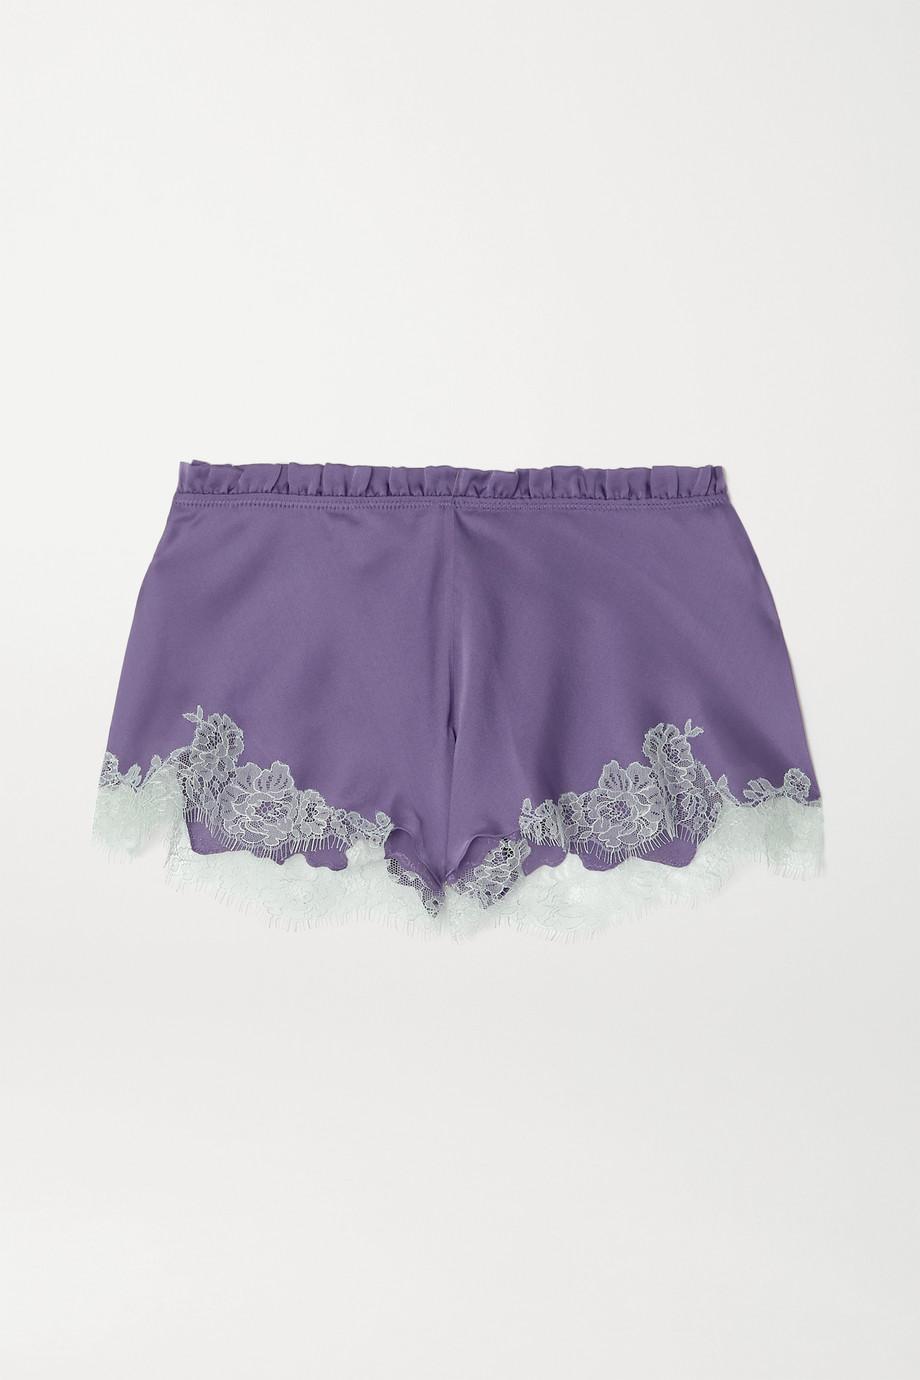 Carine Gilson Silk-satin and Chantilly lace shorts